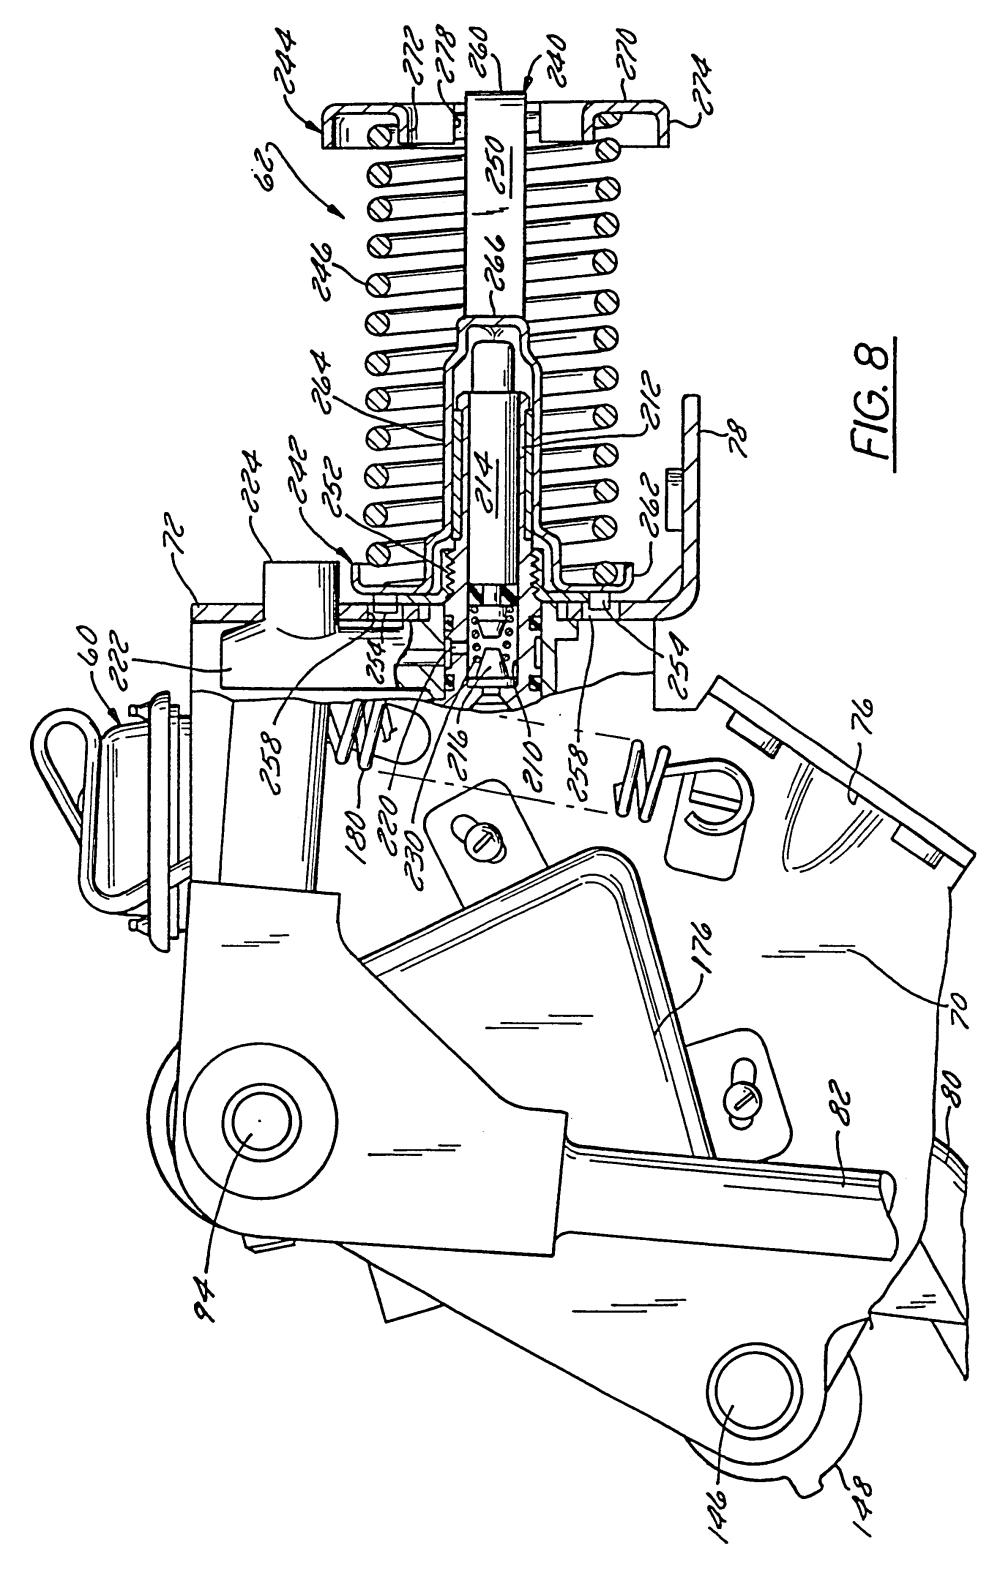 medium resolution of yamaha wiring diagram for electric golf cart free download wiring